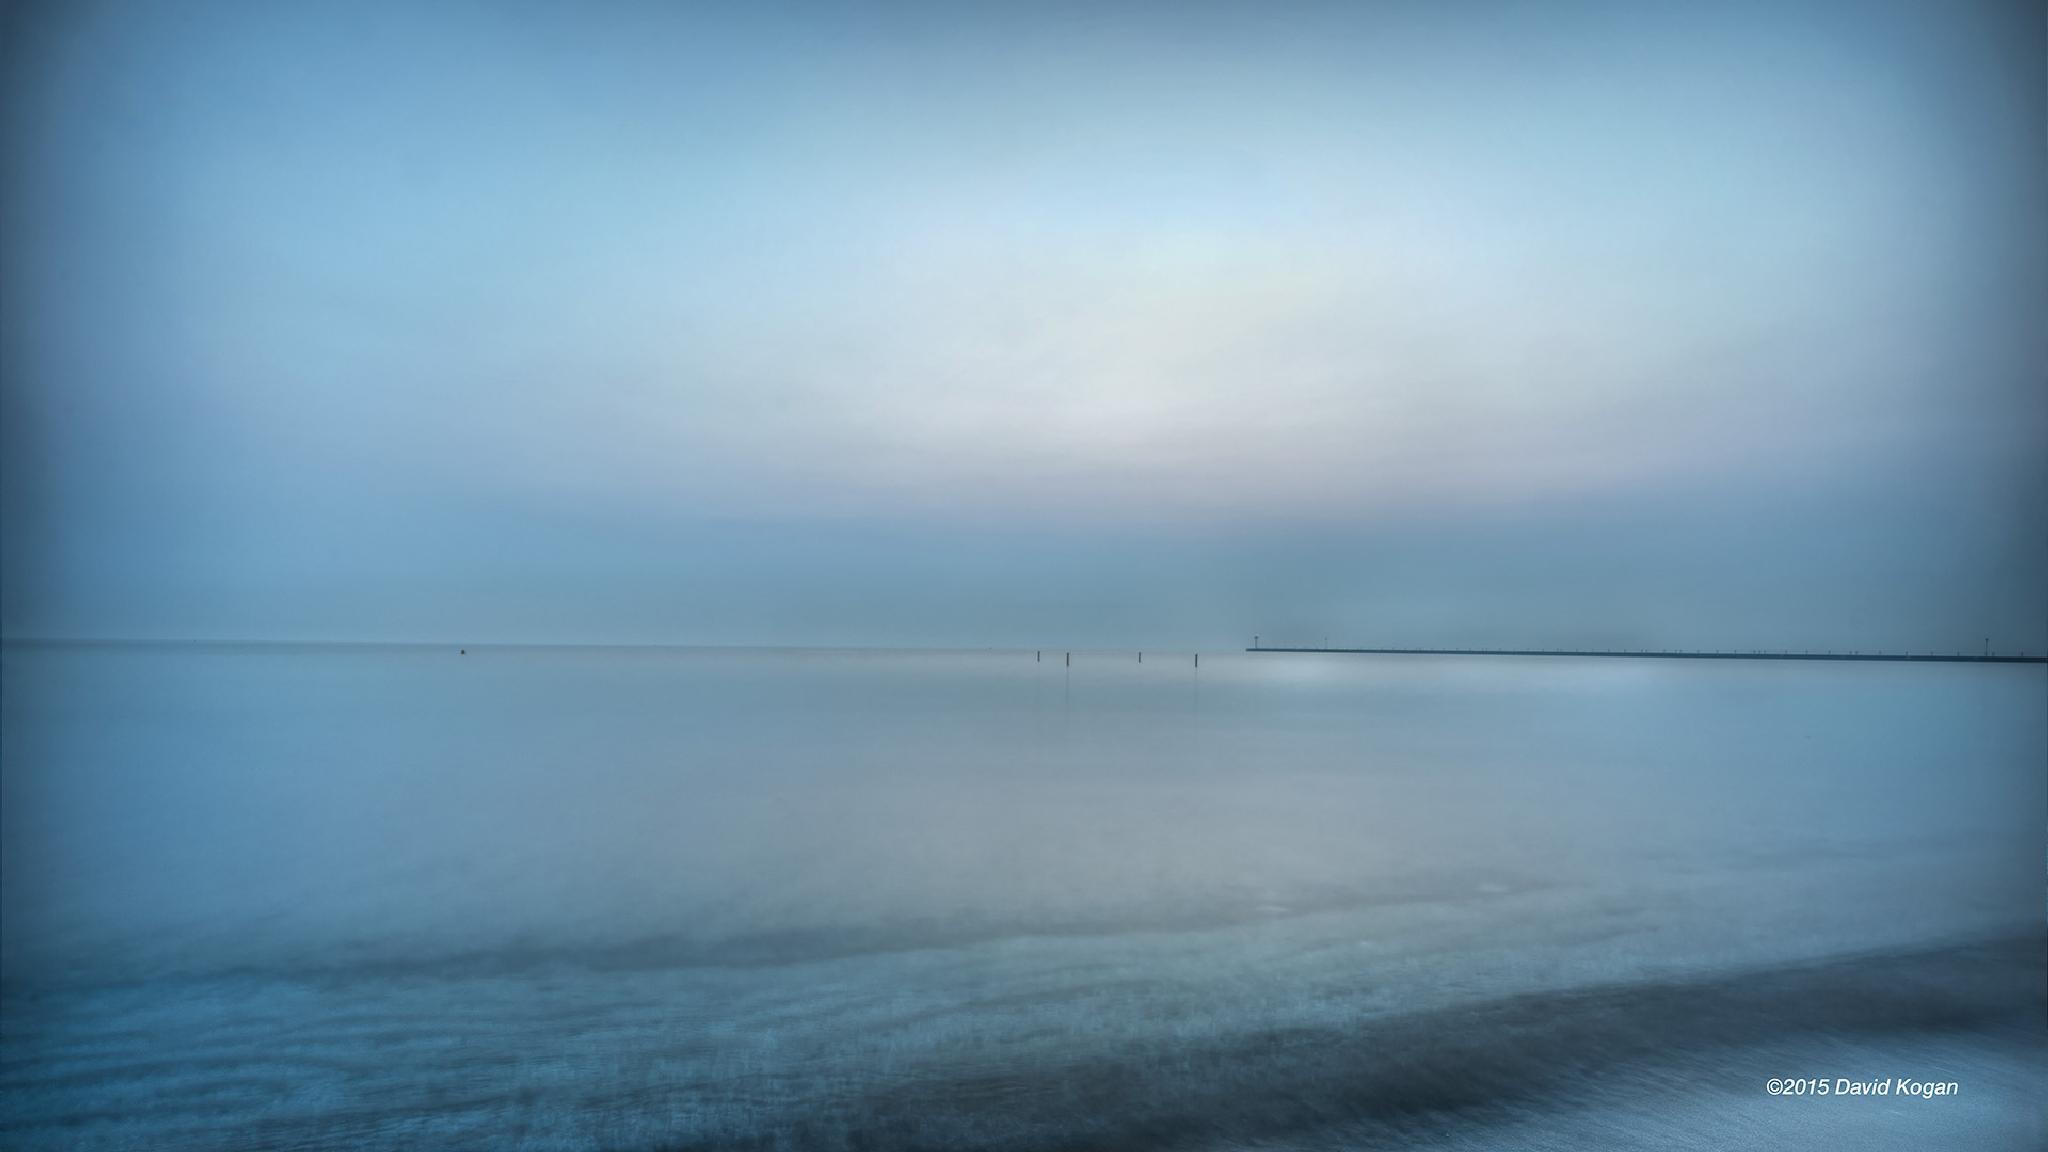 Sunrise Lake Michigan by David Kogan